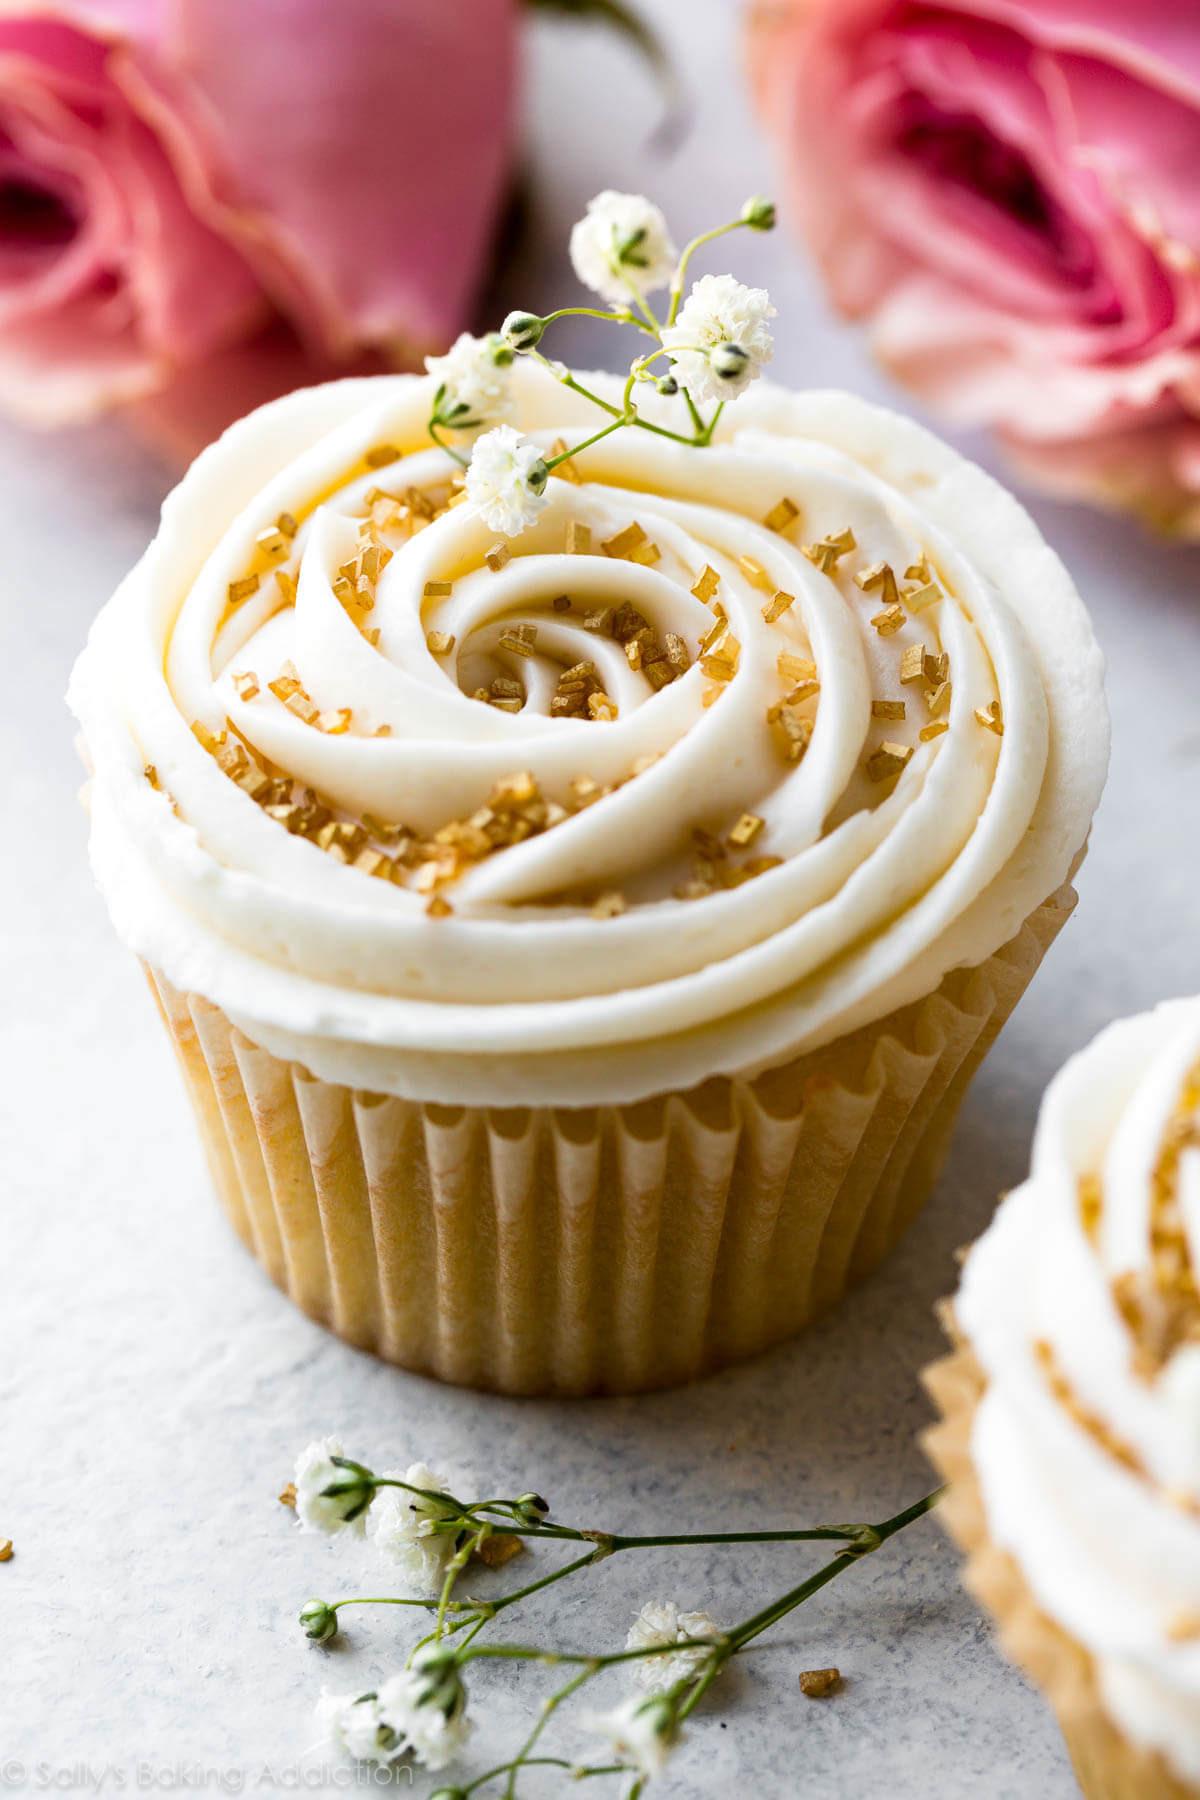 Wedding Cake Cupcake Recipe  Wedding Cupcakes with Champagne Frosting Sallys Baking